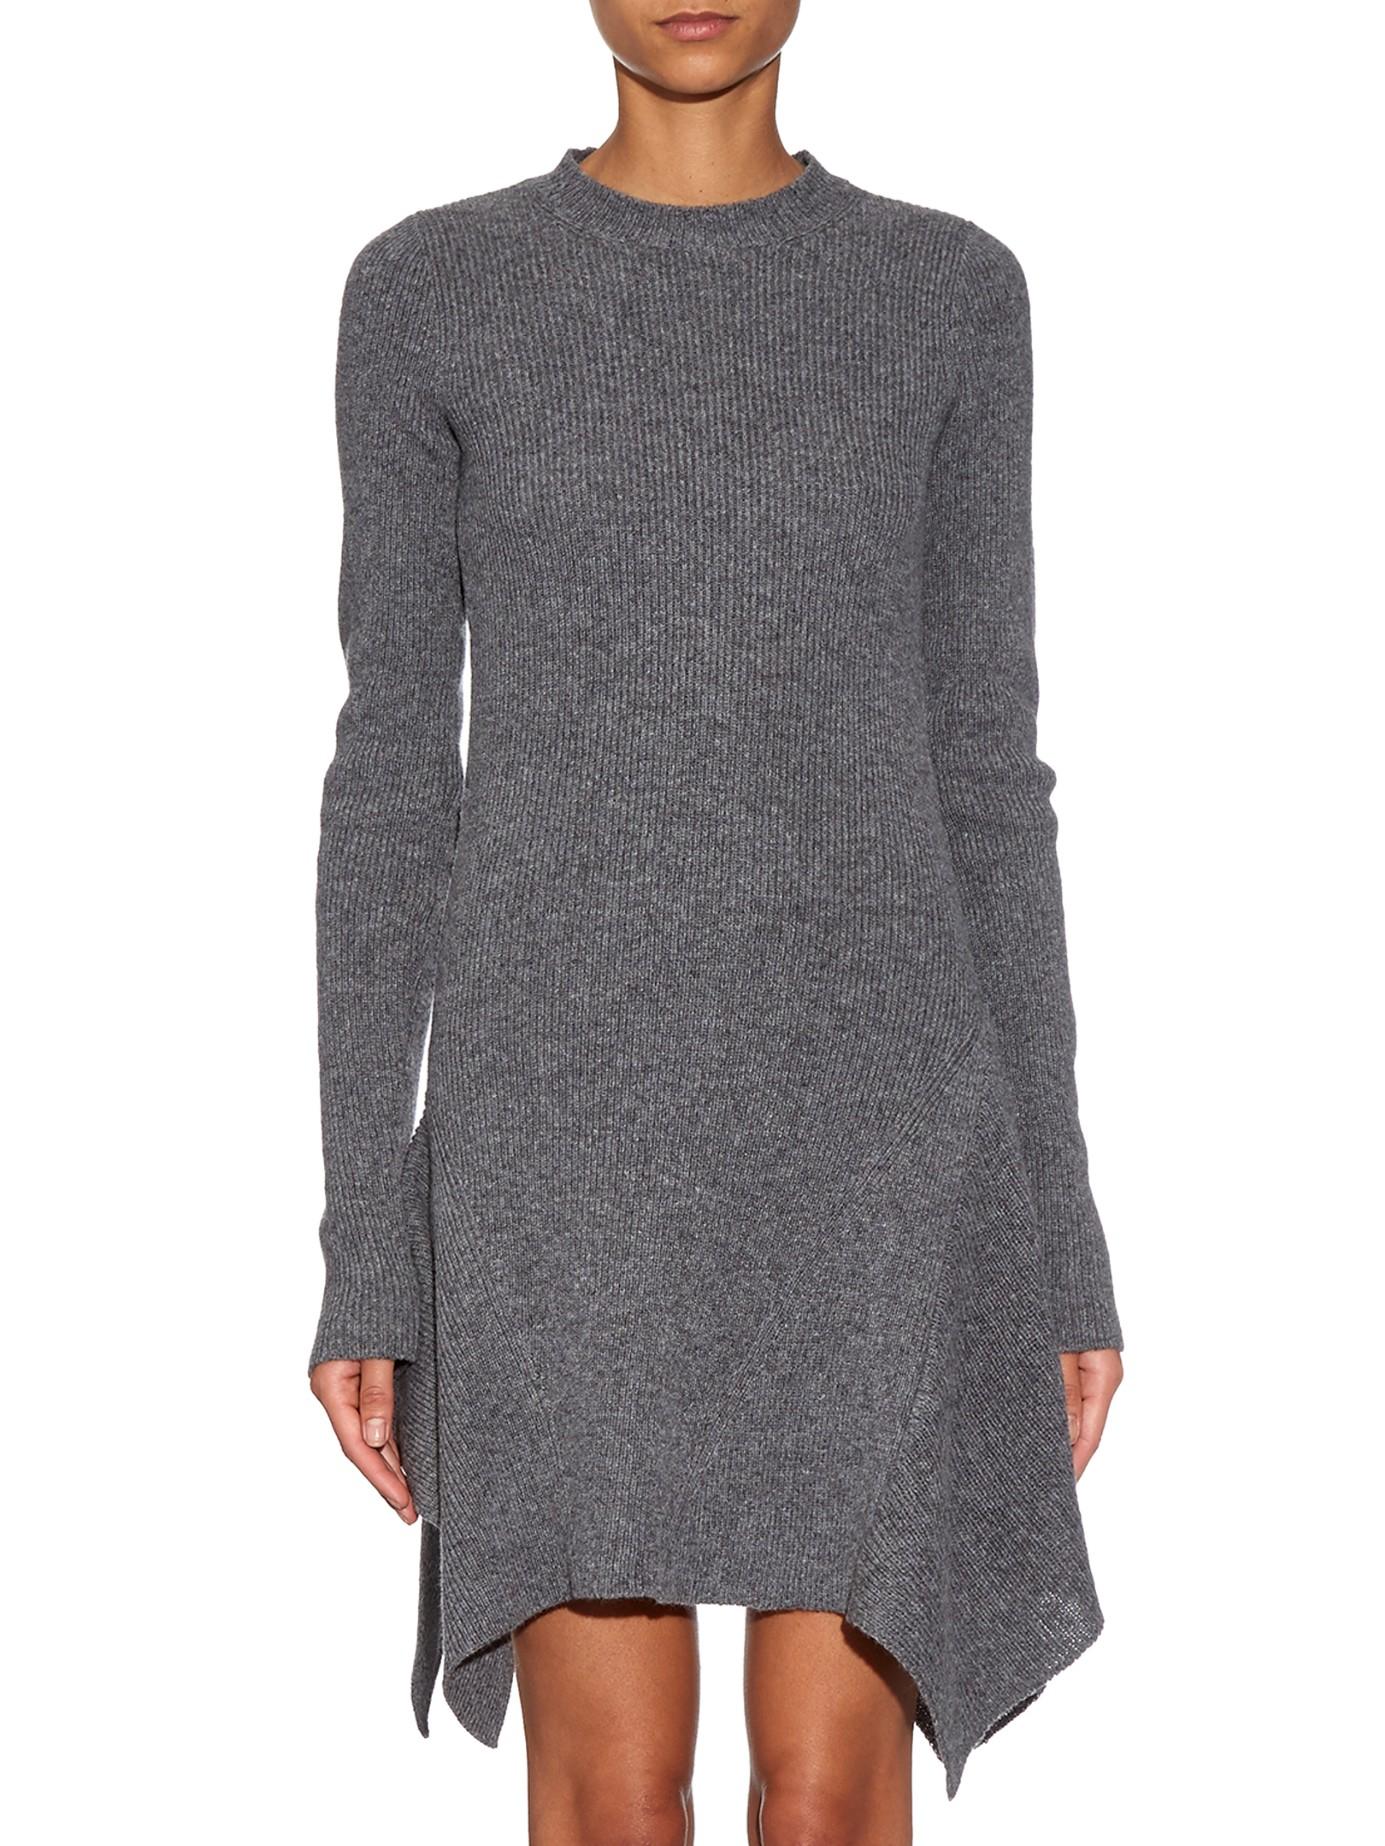 asymmetric knit dress - Grey Stella McCartney Discount 2018 Official Site Cheap Online OtWUIi